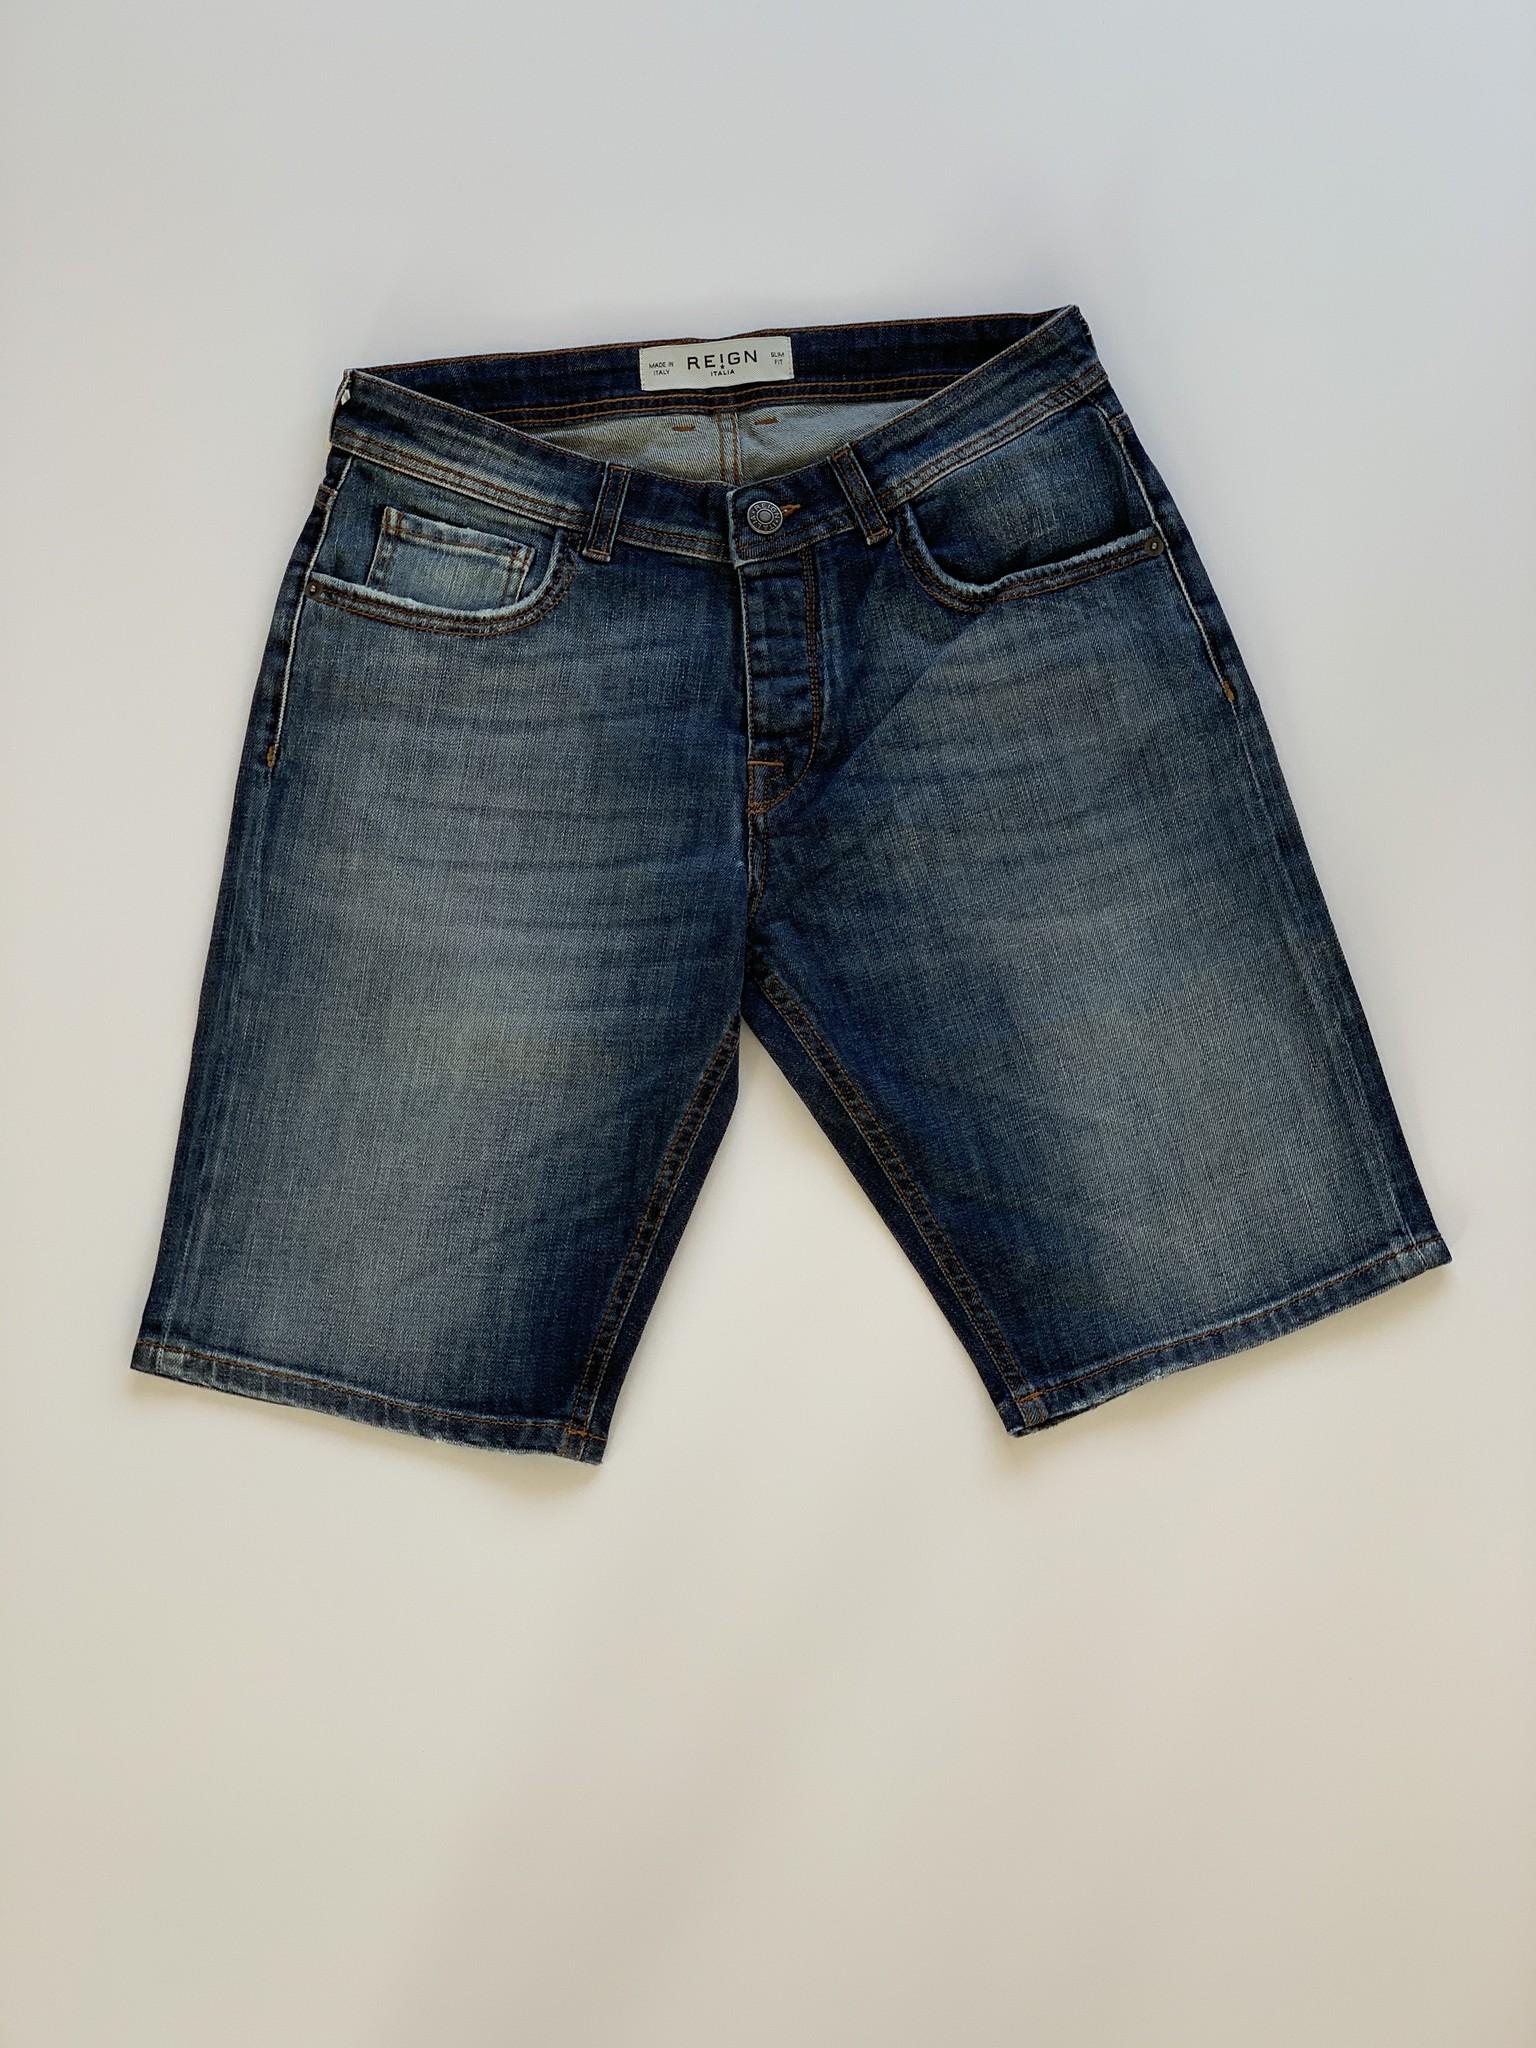 Ethan Malaga Jeans Short-1